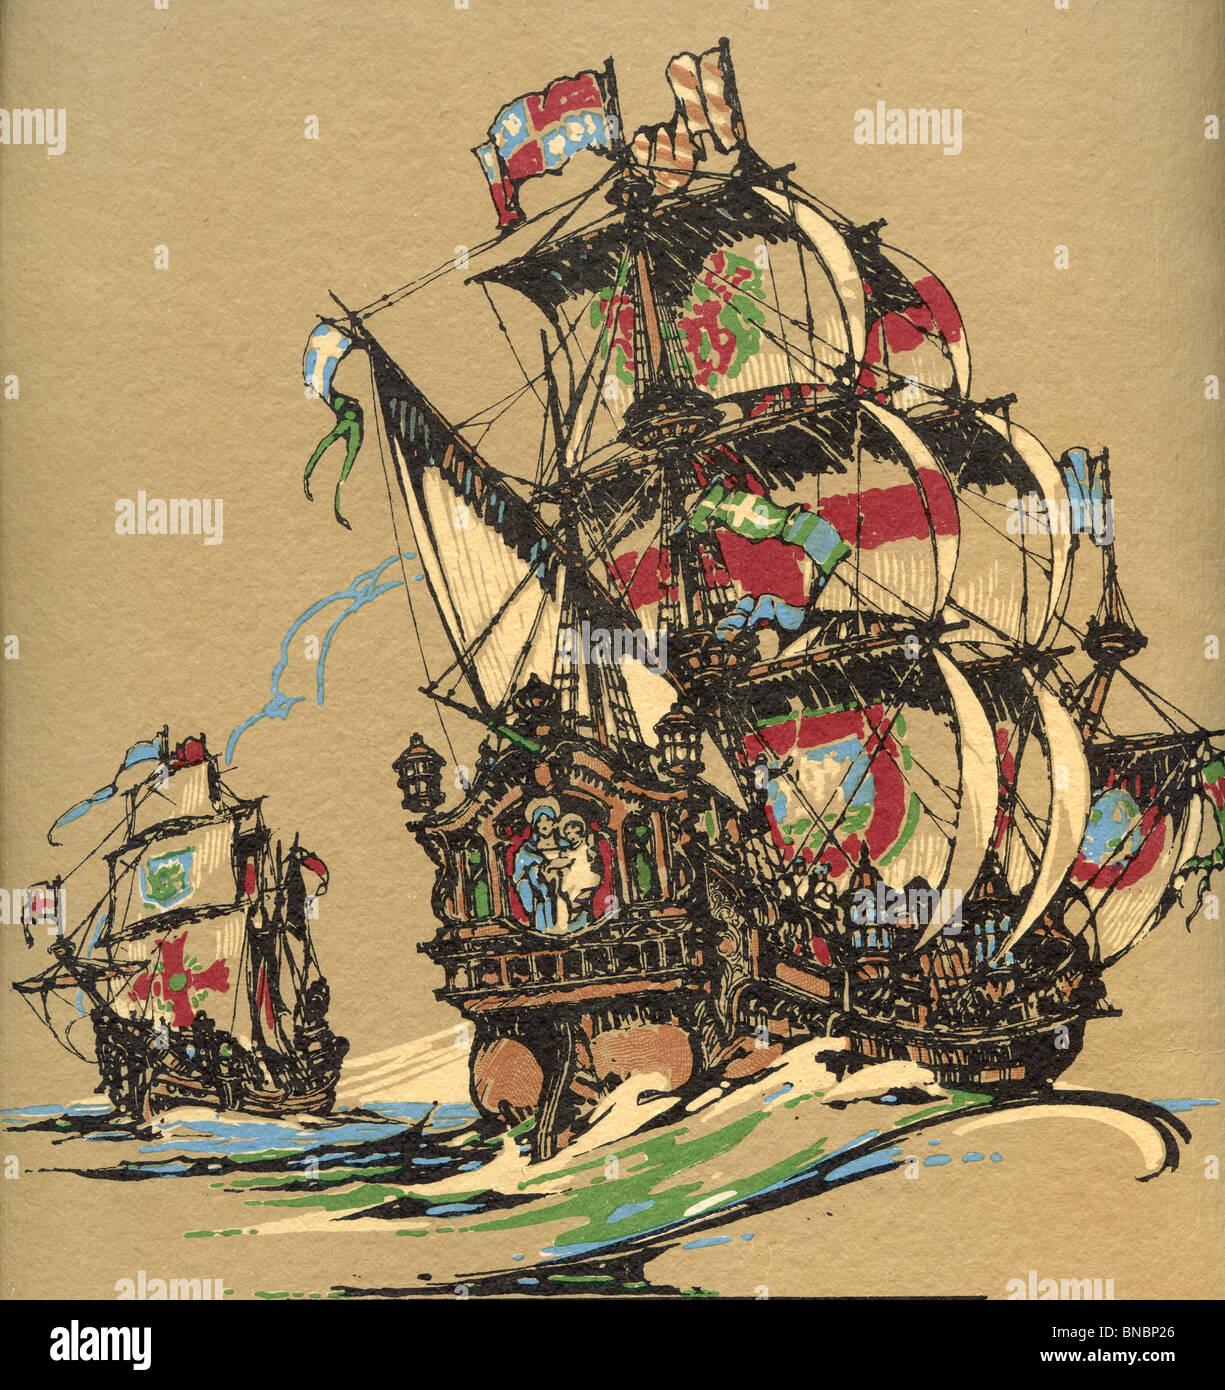 Battleships - Stock Image